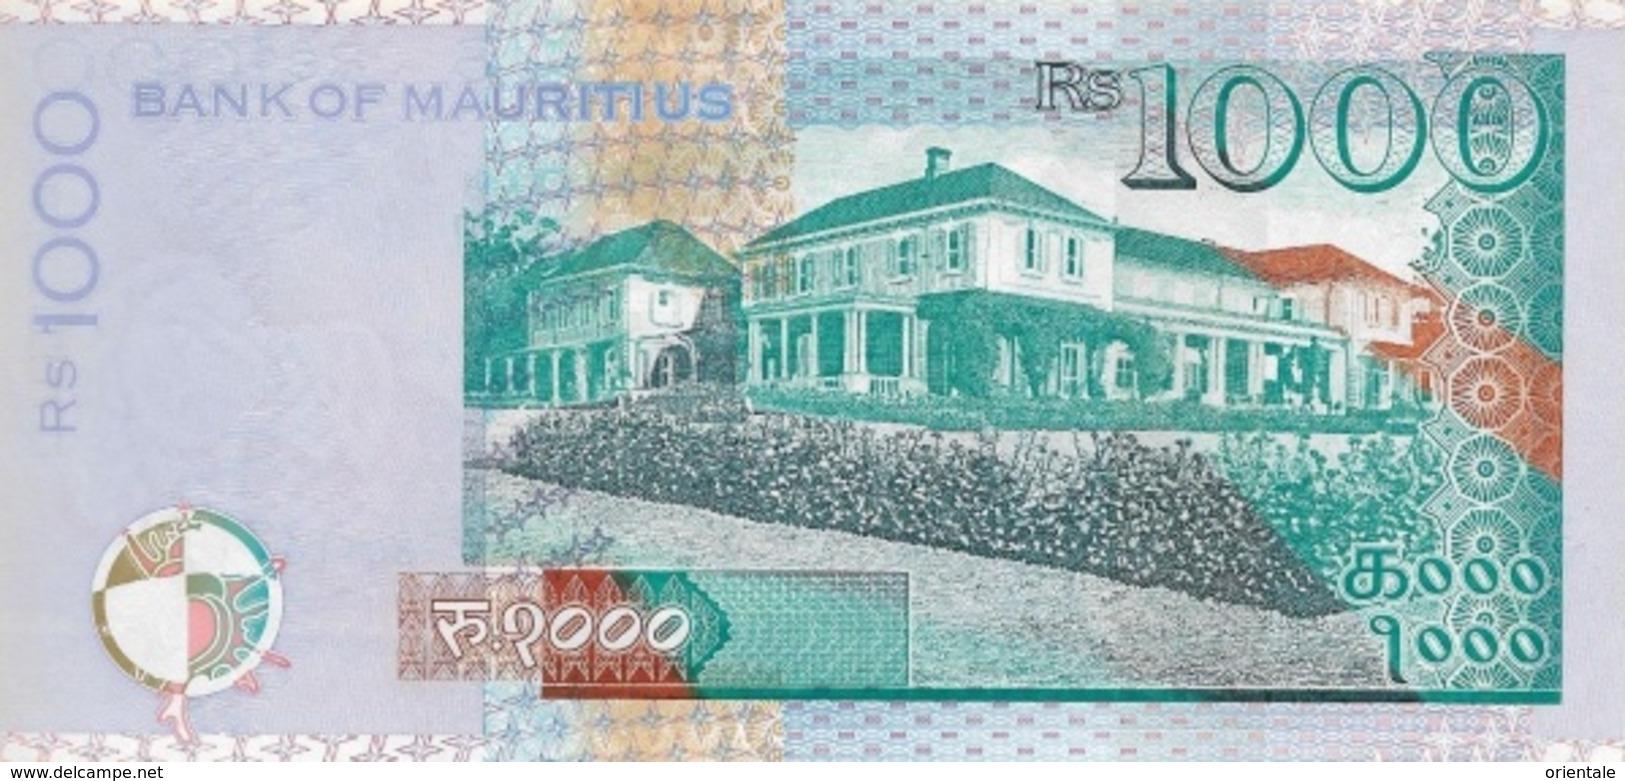 MAURITIUS P. 63d 1000 R 2017 UNC - Maurice